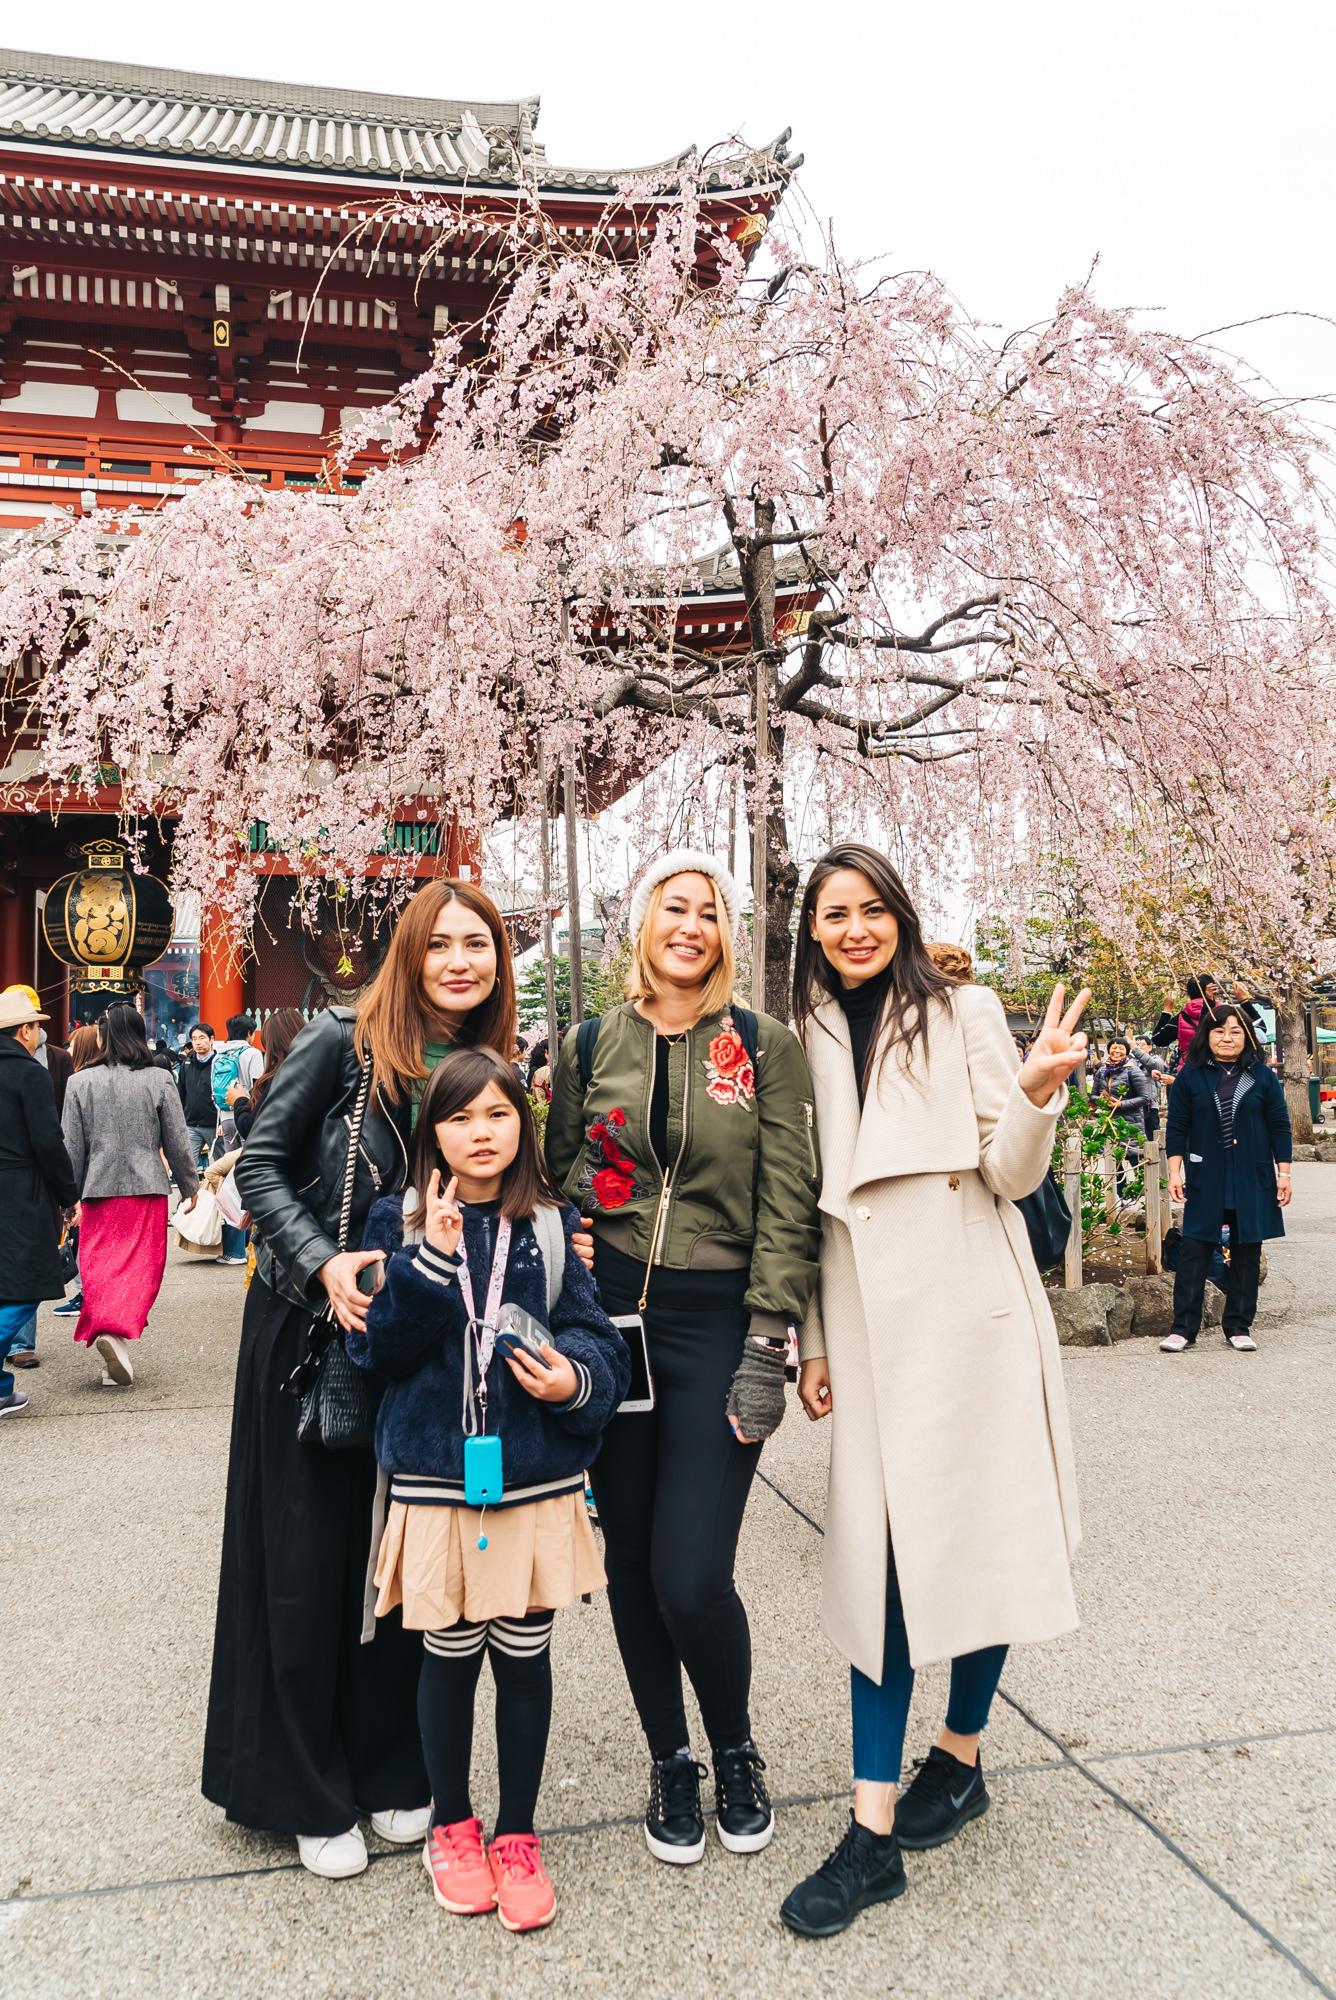 Gorgeous cherry blossom tree by the Sensoji Temple